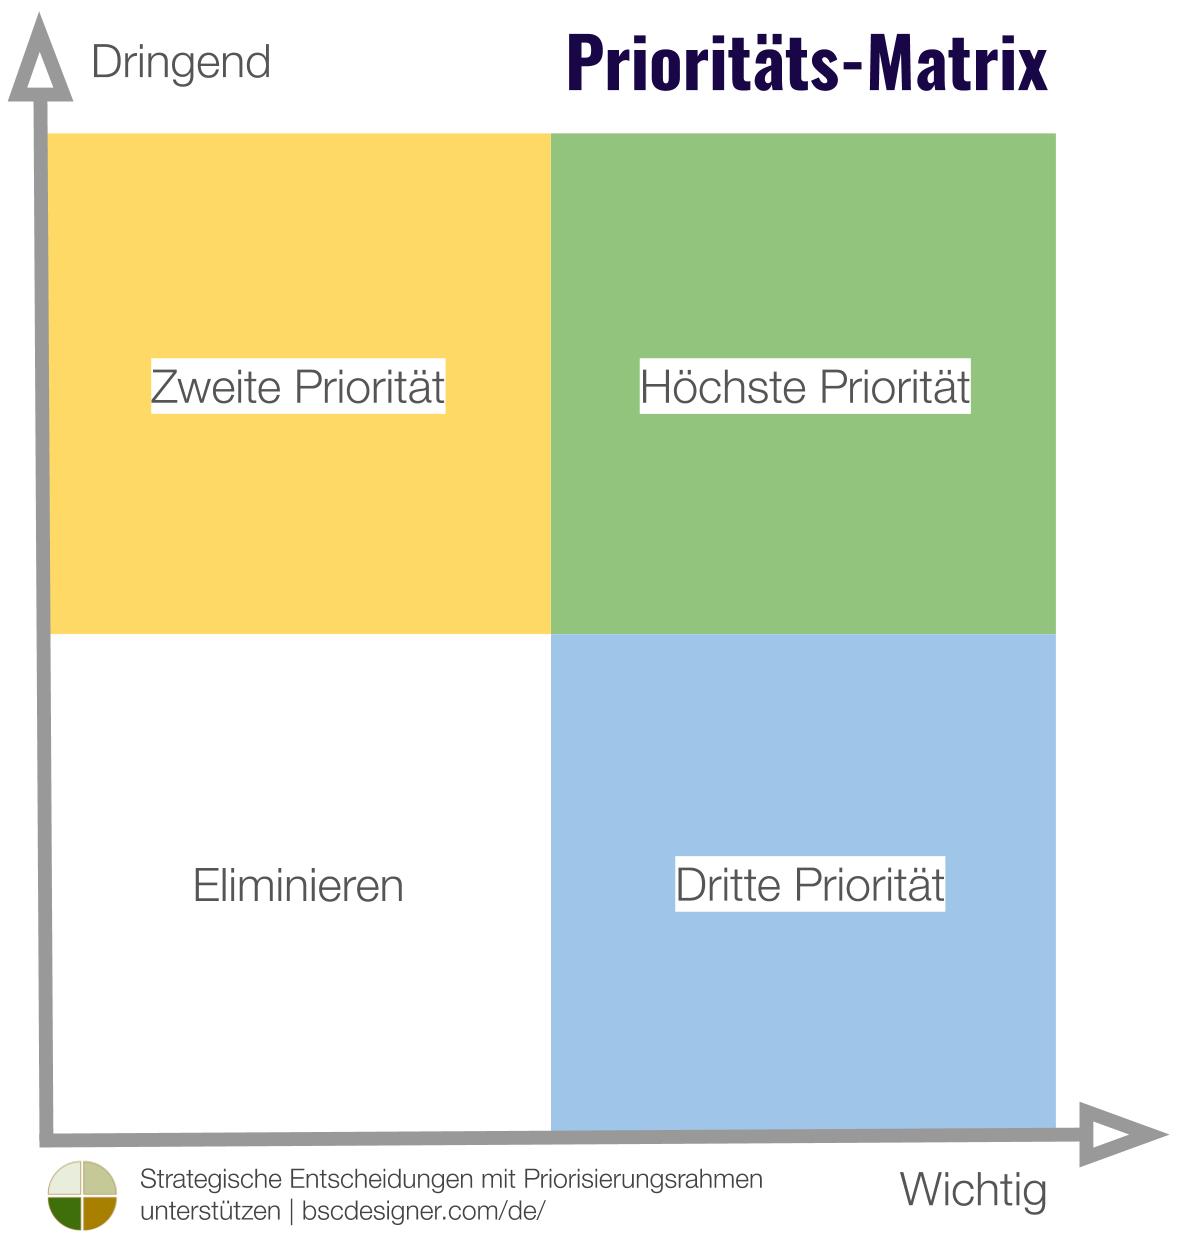 Prioritätsmatrix